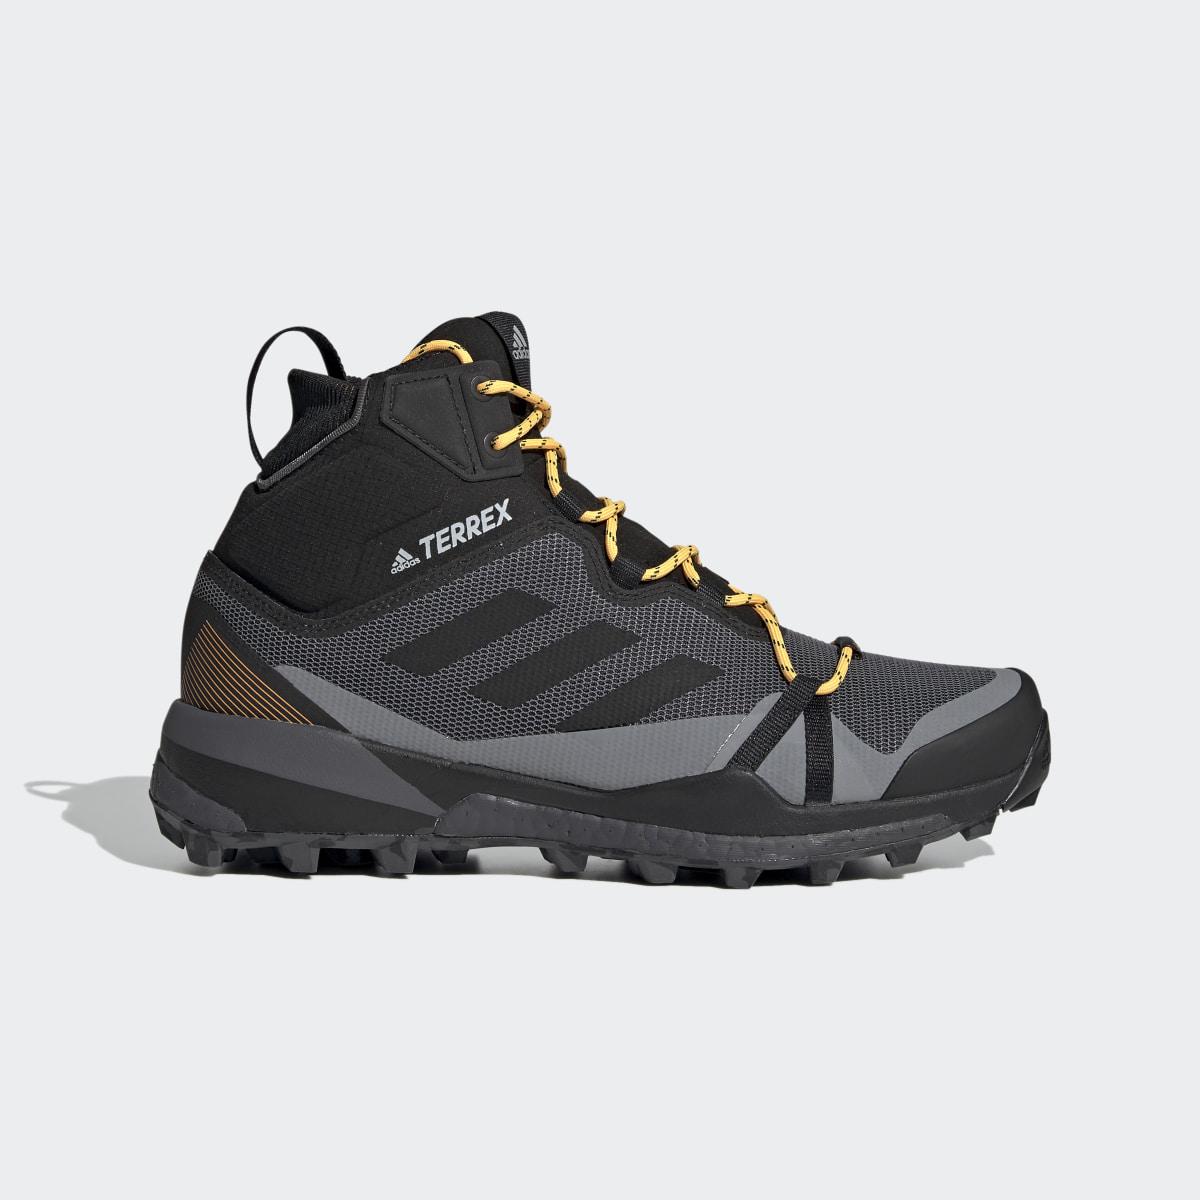 Chaussure de randonnée Terrex Skychaser LT Mid GORE-TEX